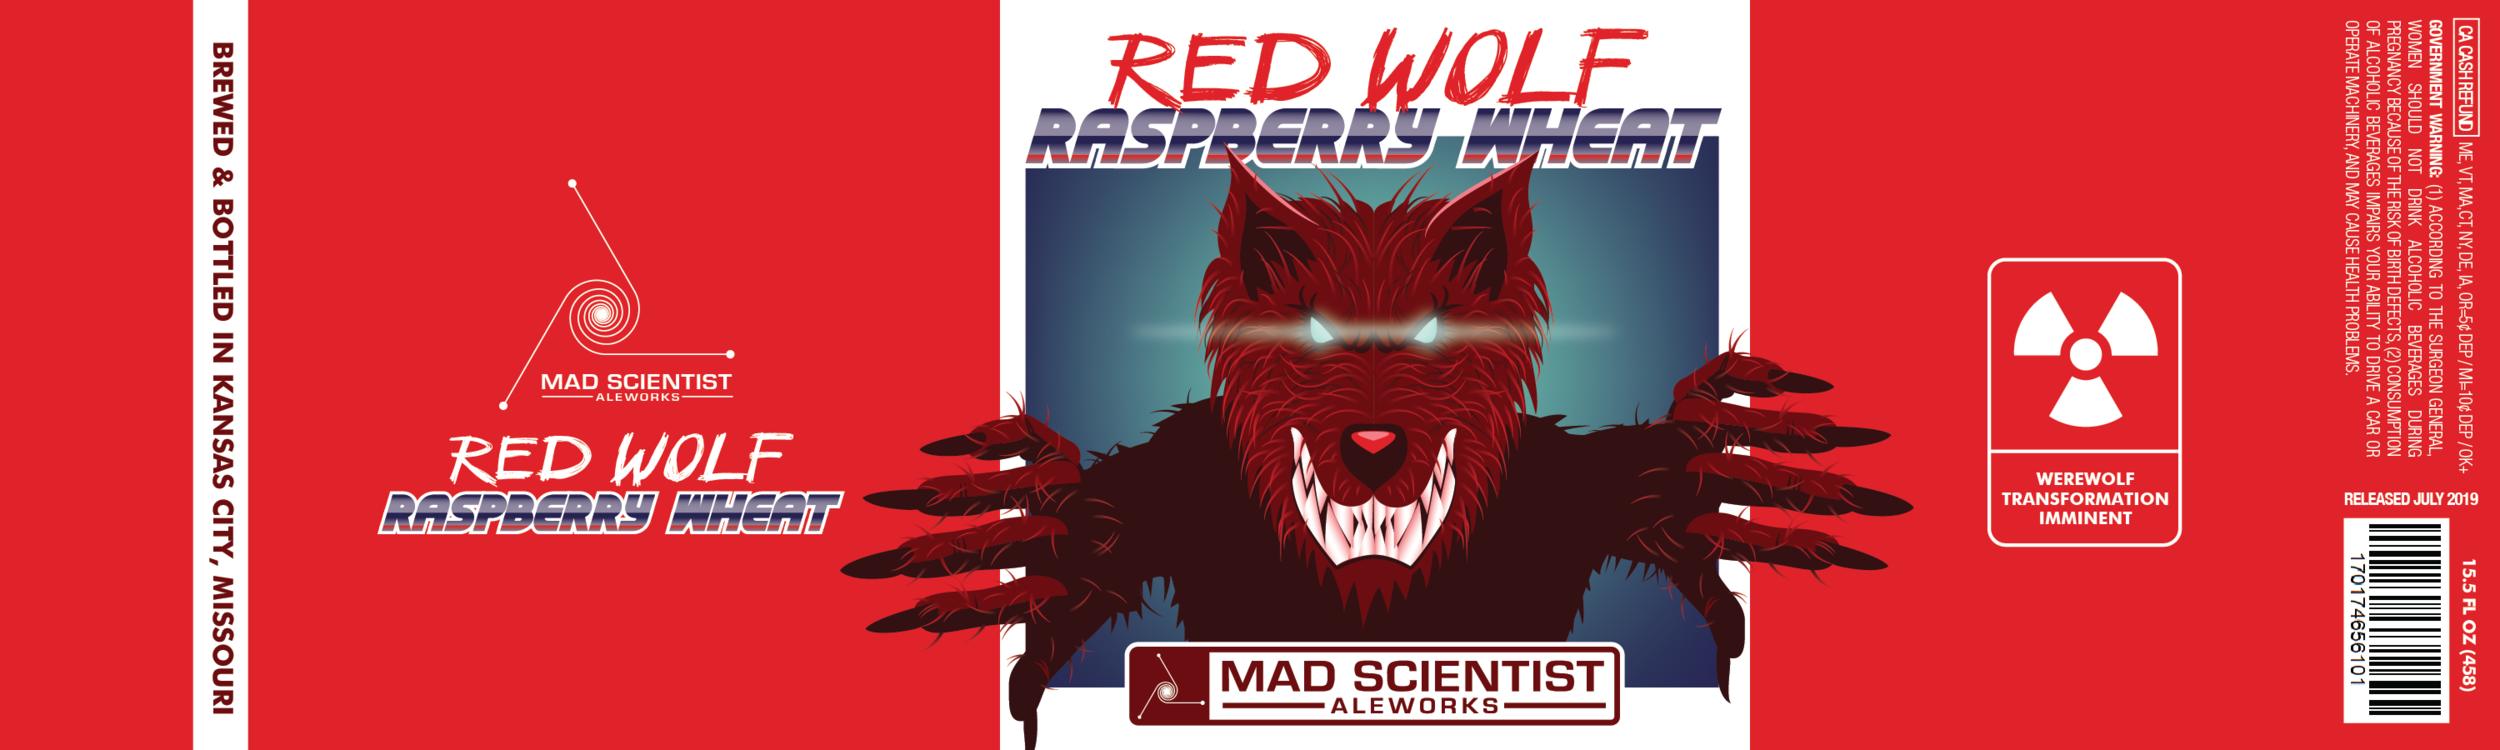 RedWolf-Label_design-01.png